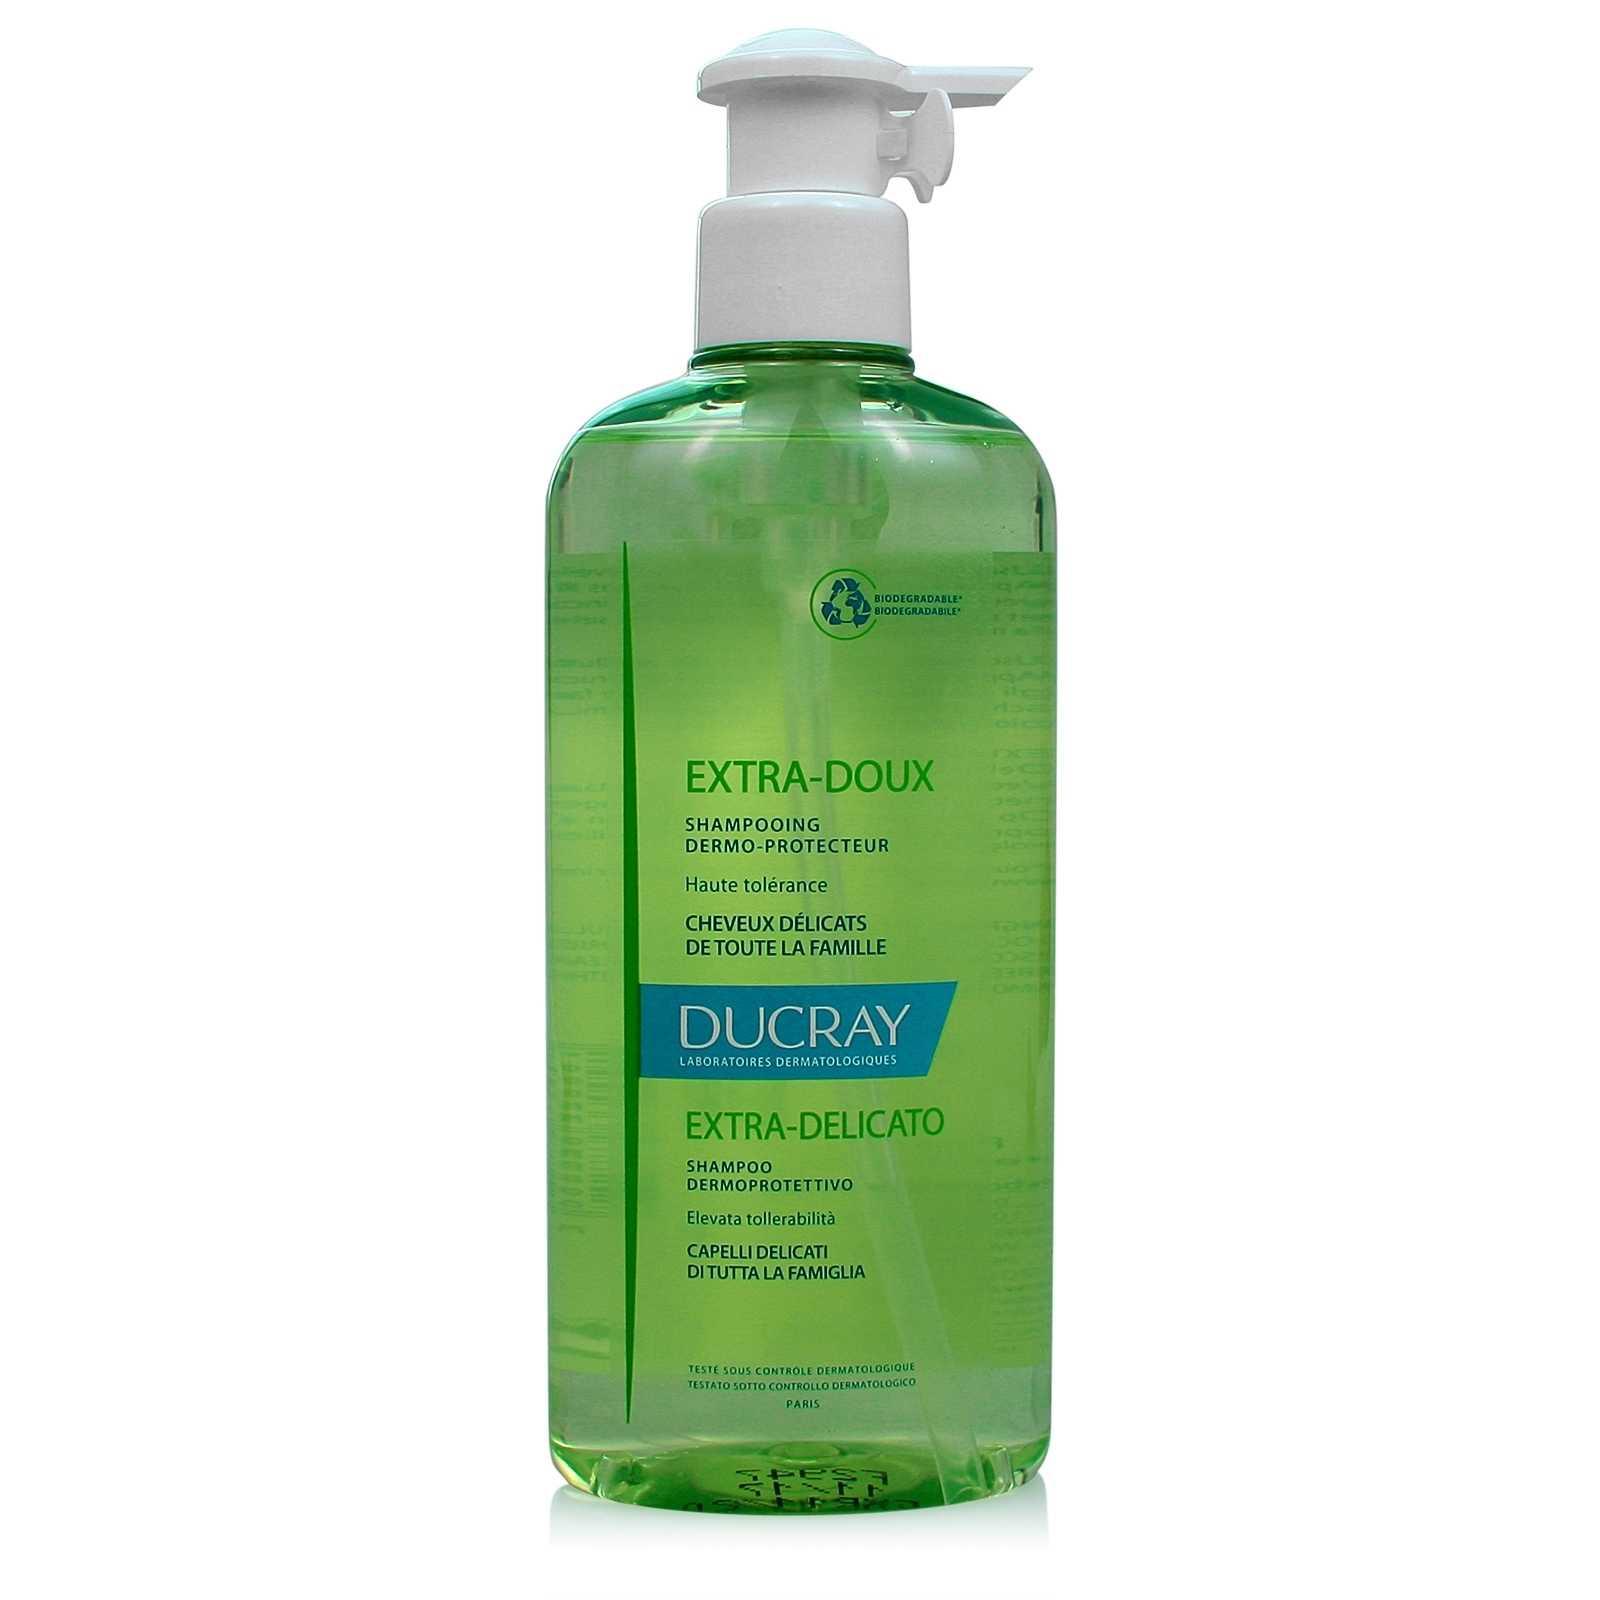 Ducray - Shampoo Extra-Delicato - 400ml